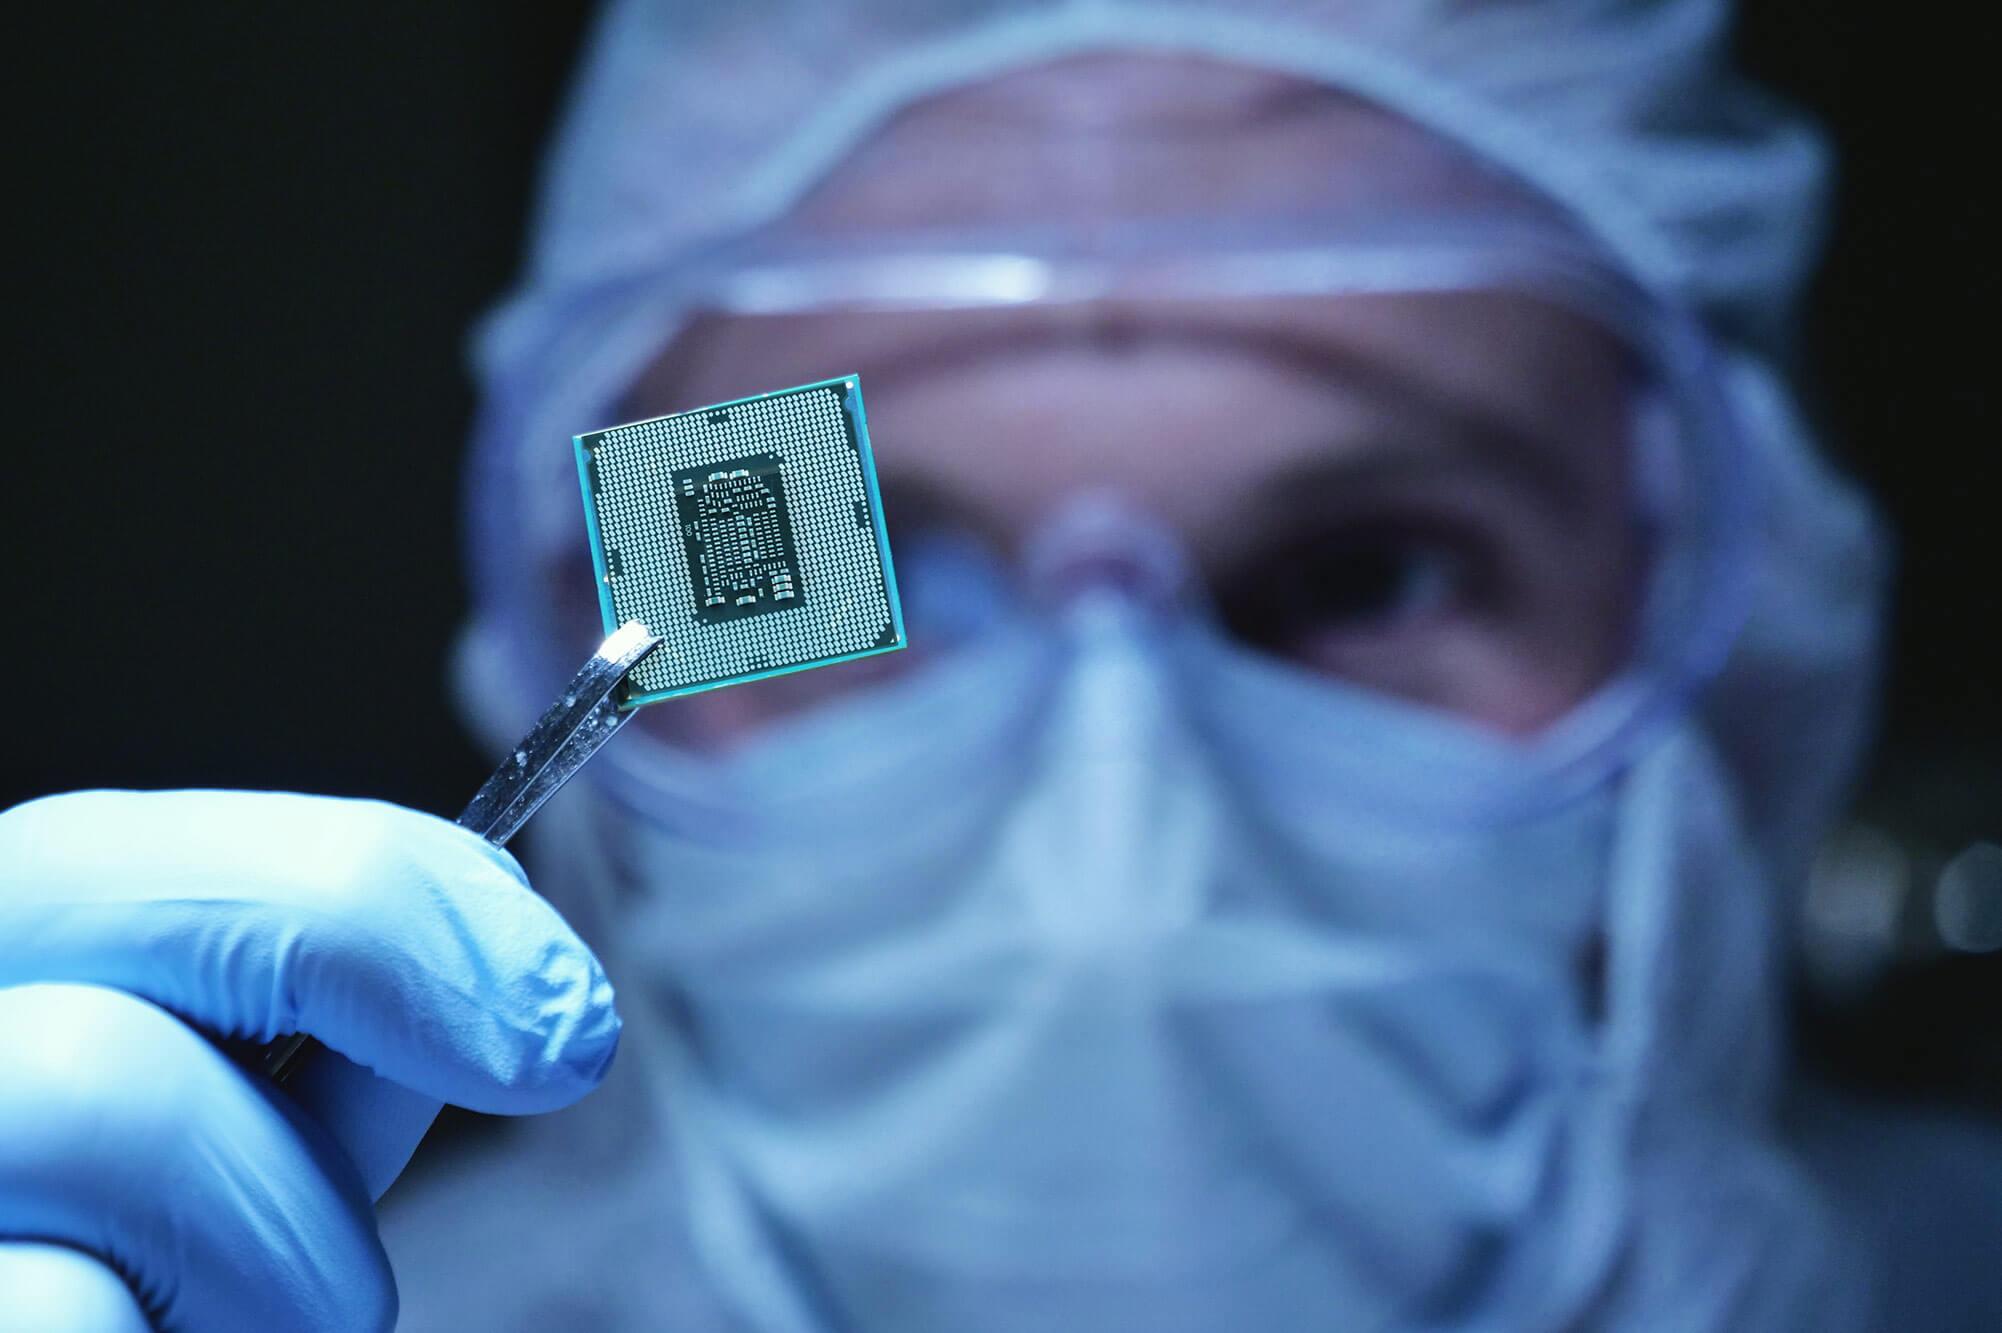 Biosensor / Biochip